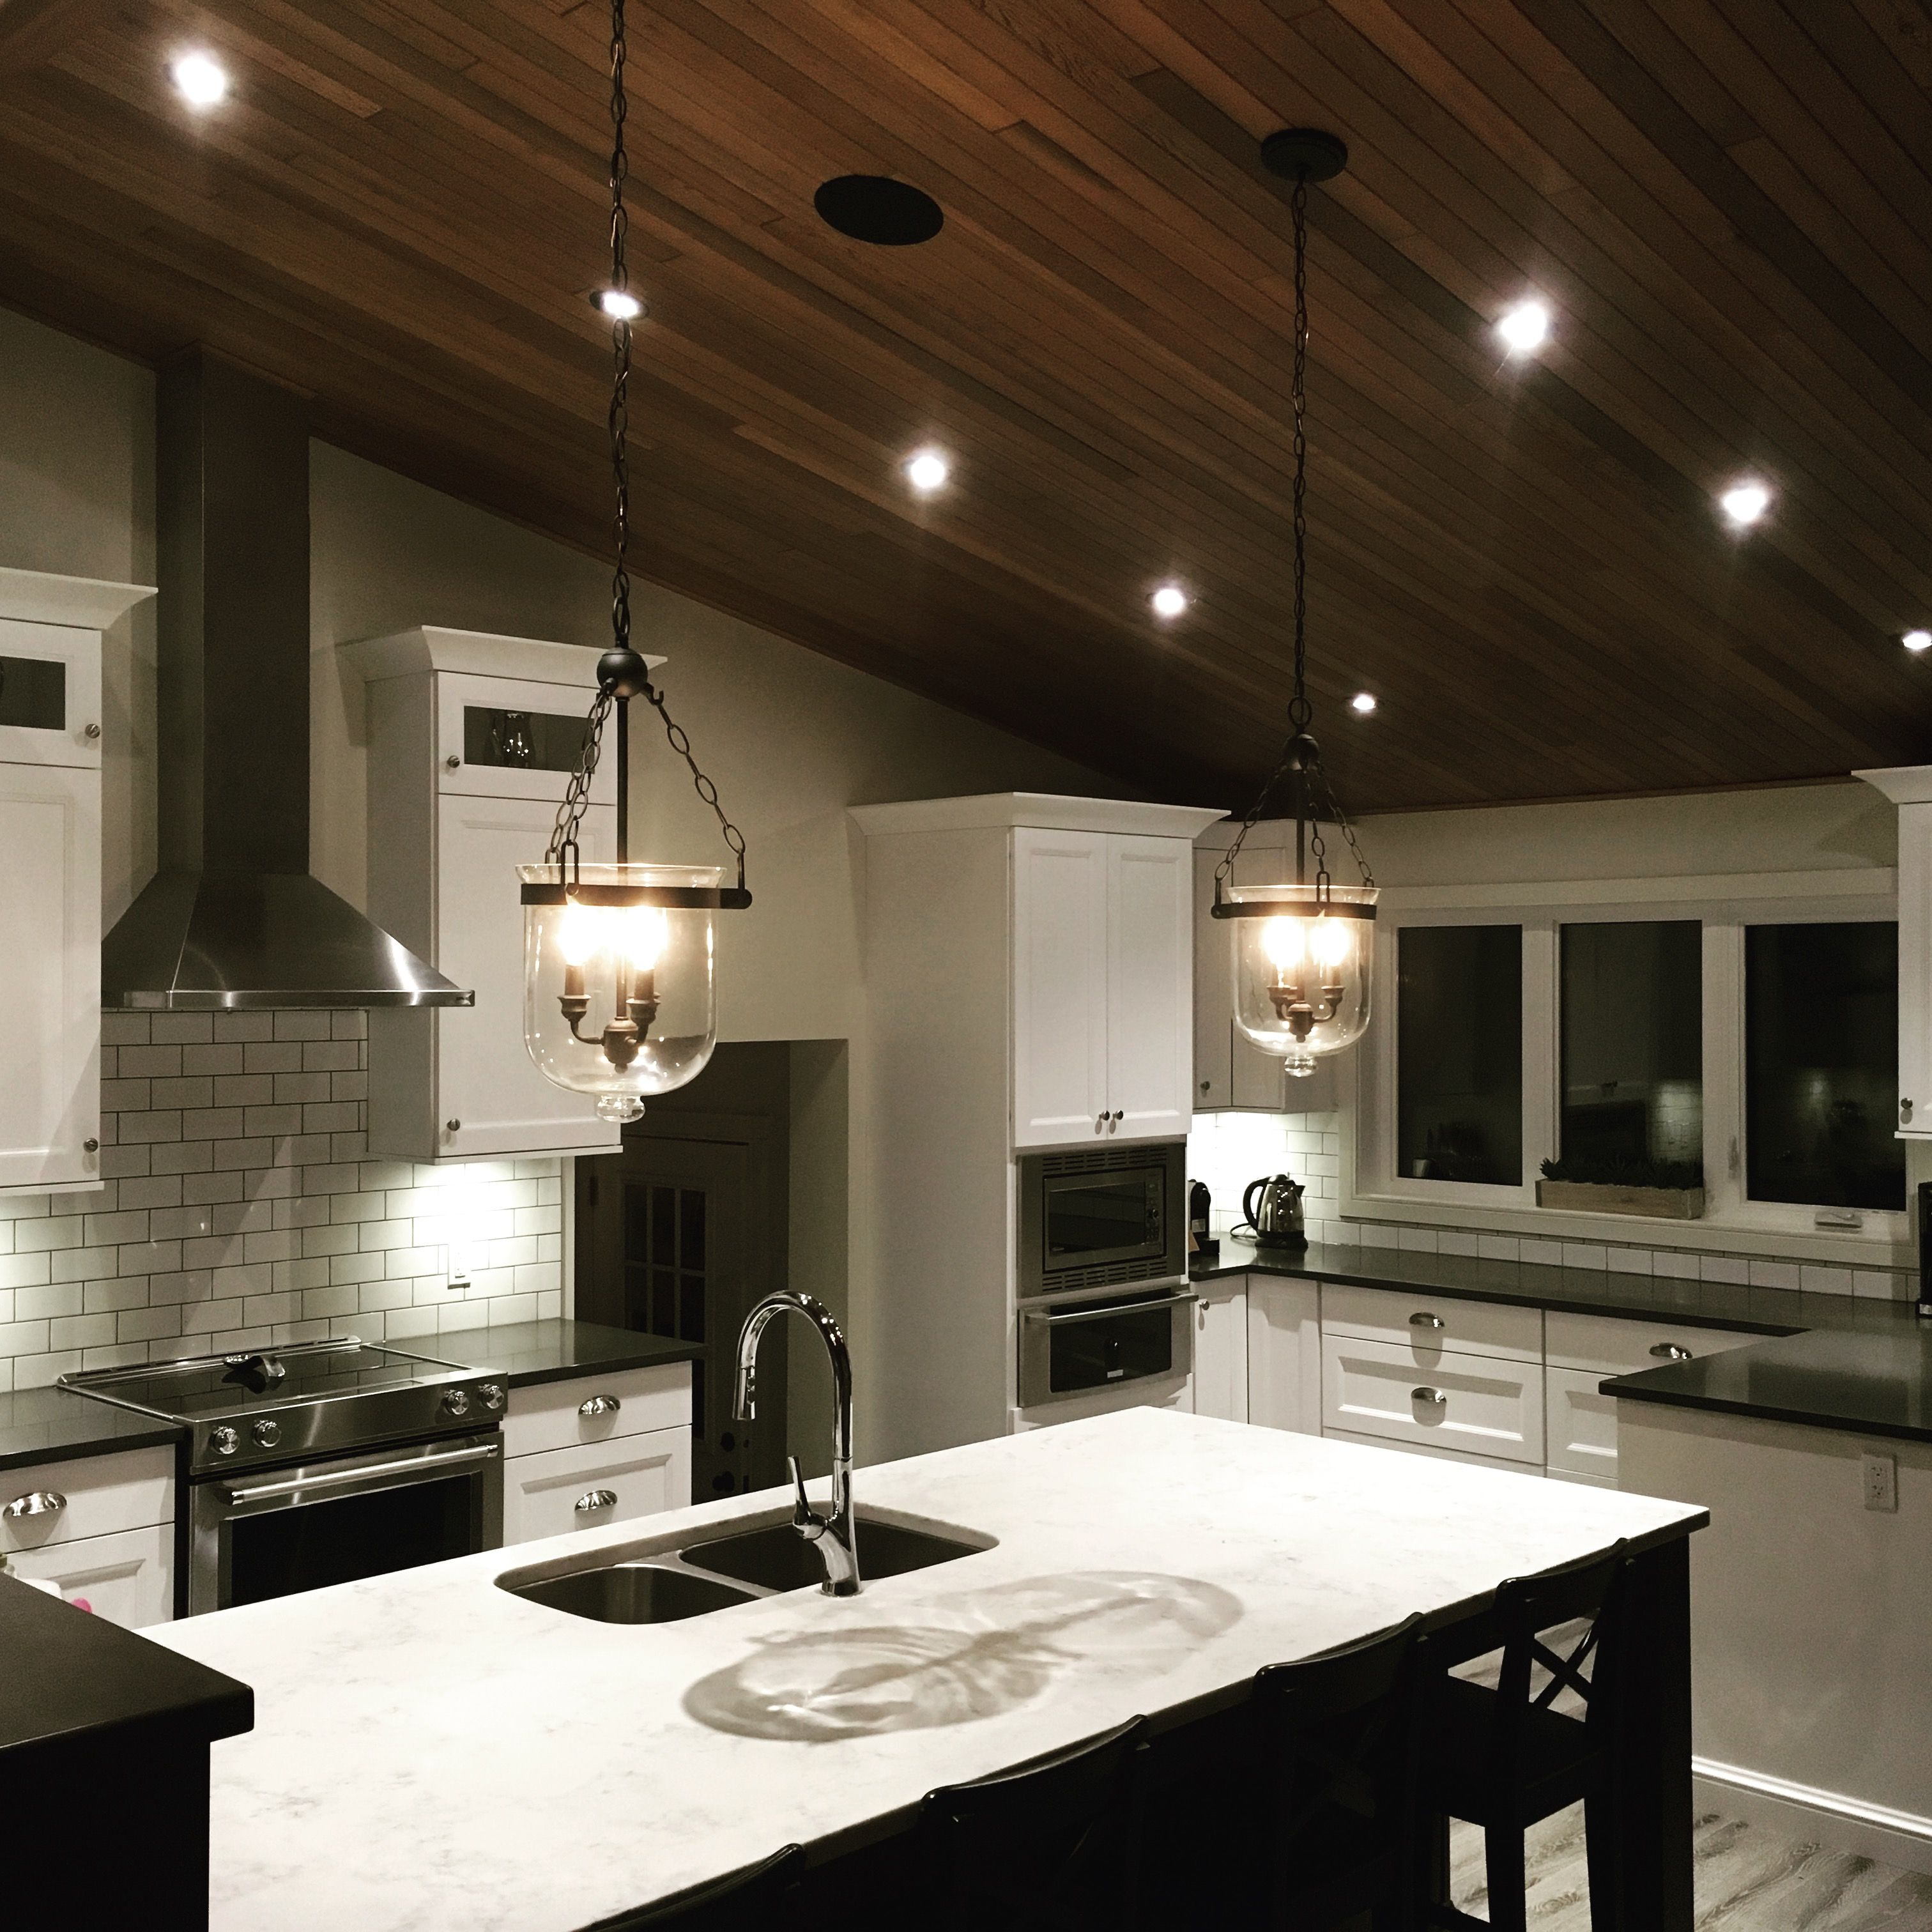 Kitchen Reno, Lutron Radio Ra2 Lighting Control, Russound Audio System